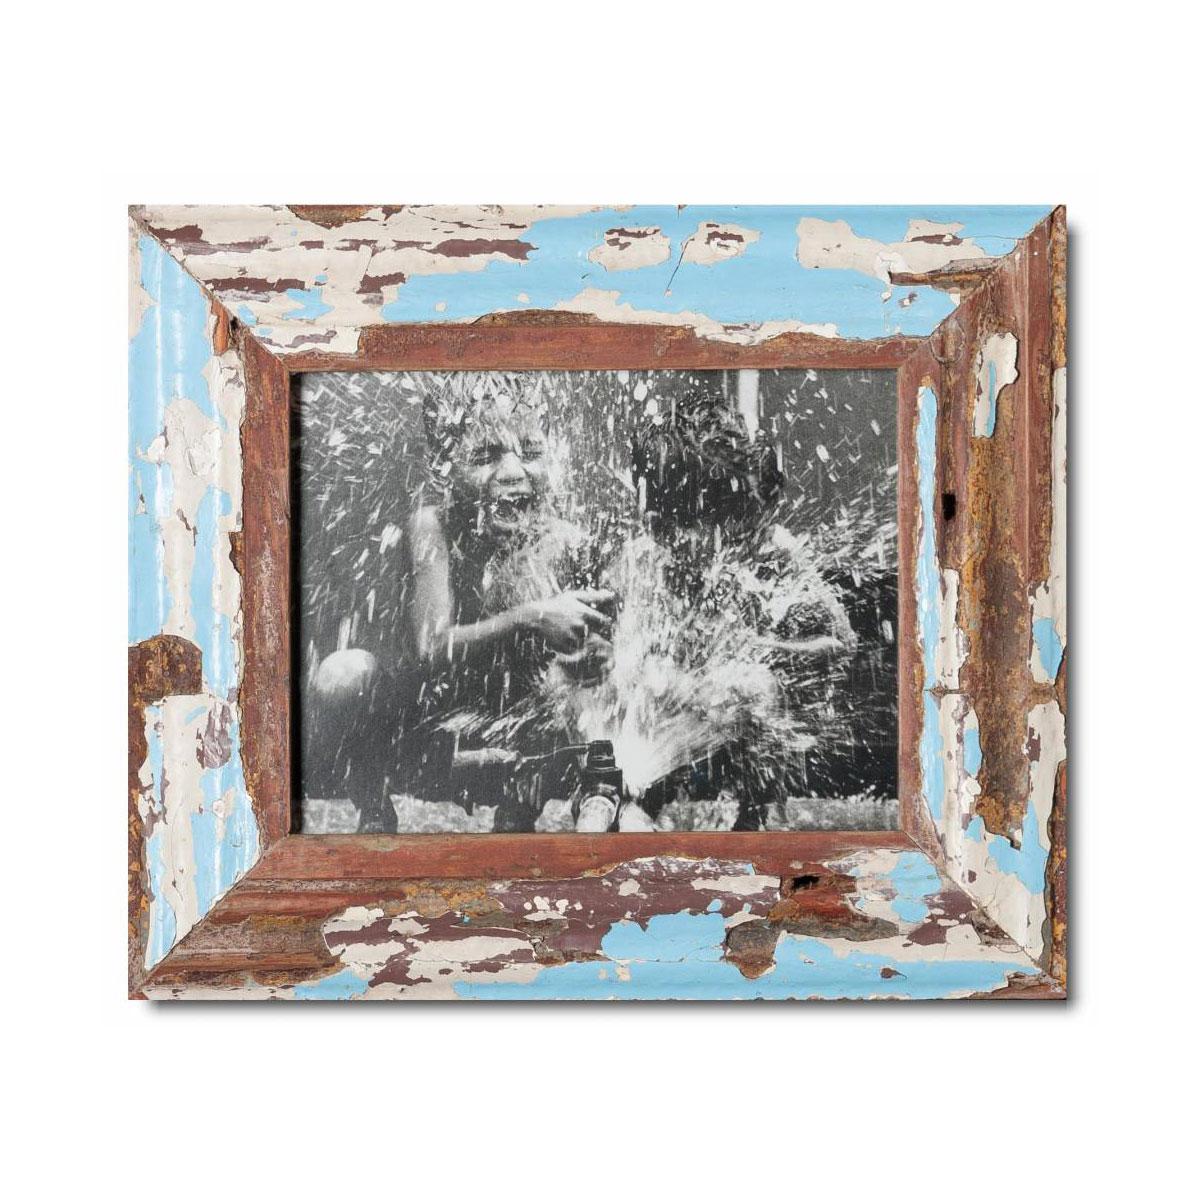 Unikat Vinatge-Bilderrahmen aus recyceltem Holz -15 x 20 von LUNA design company